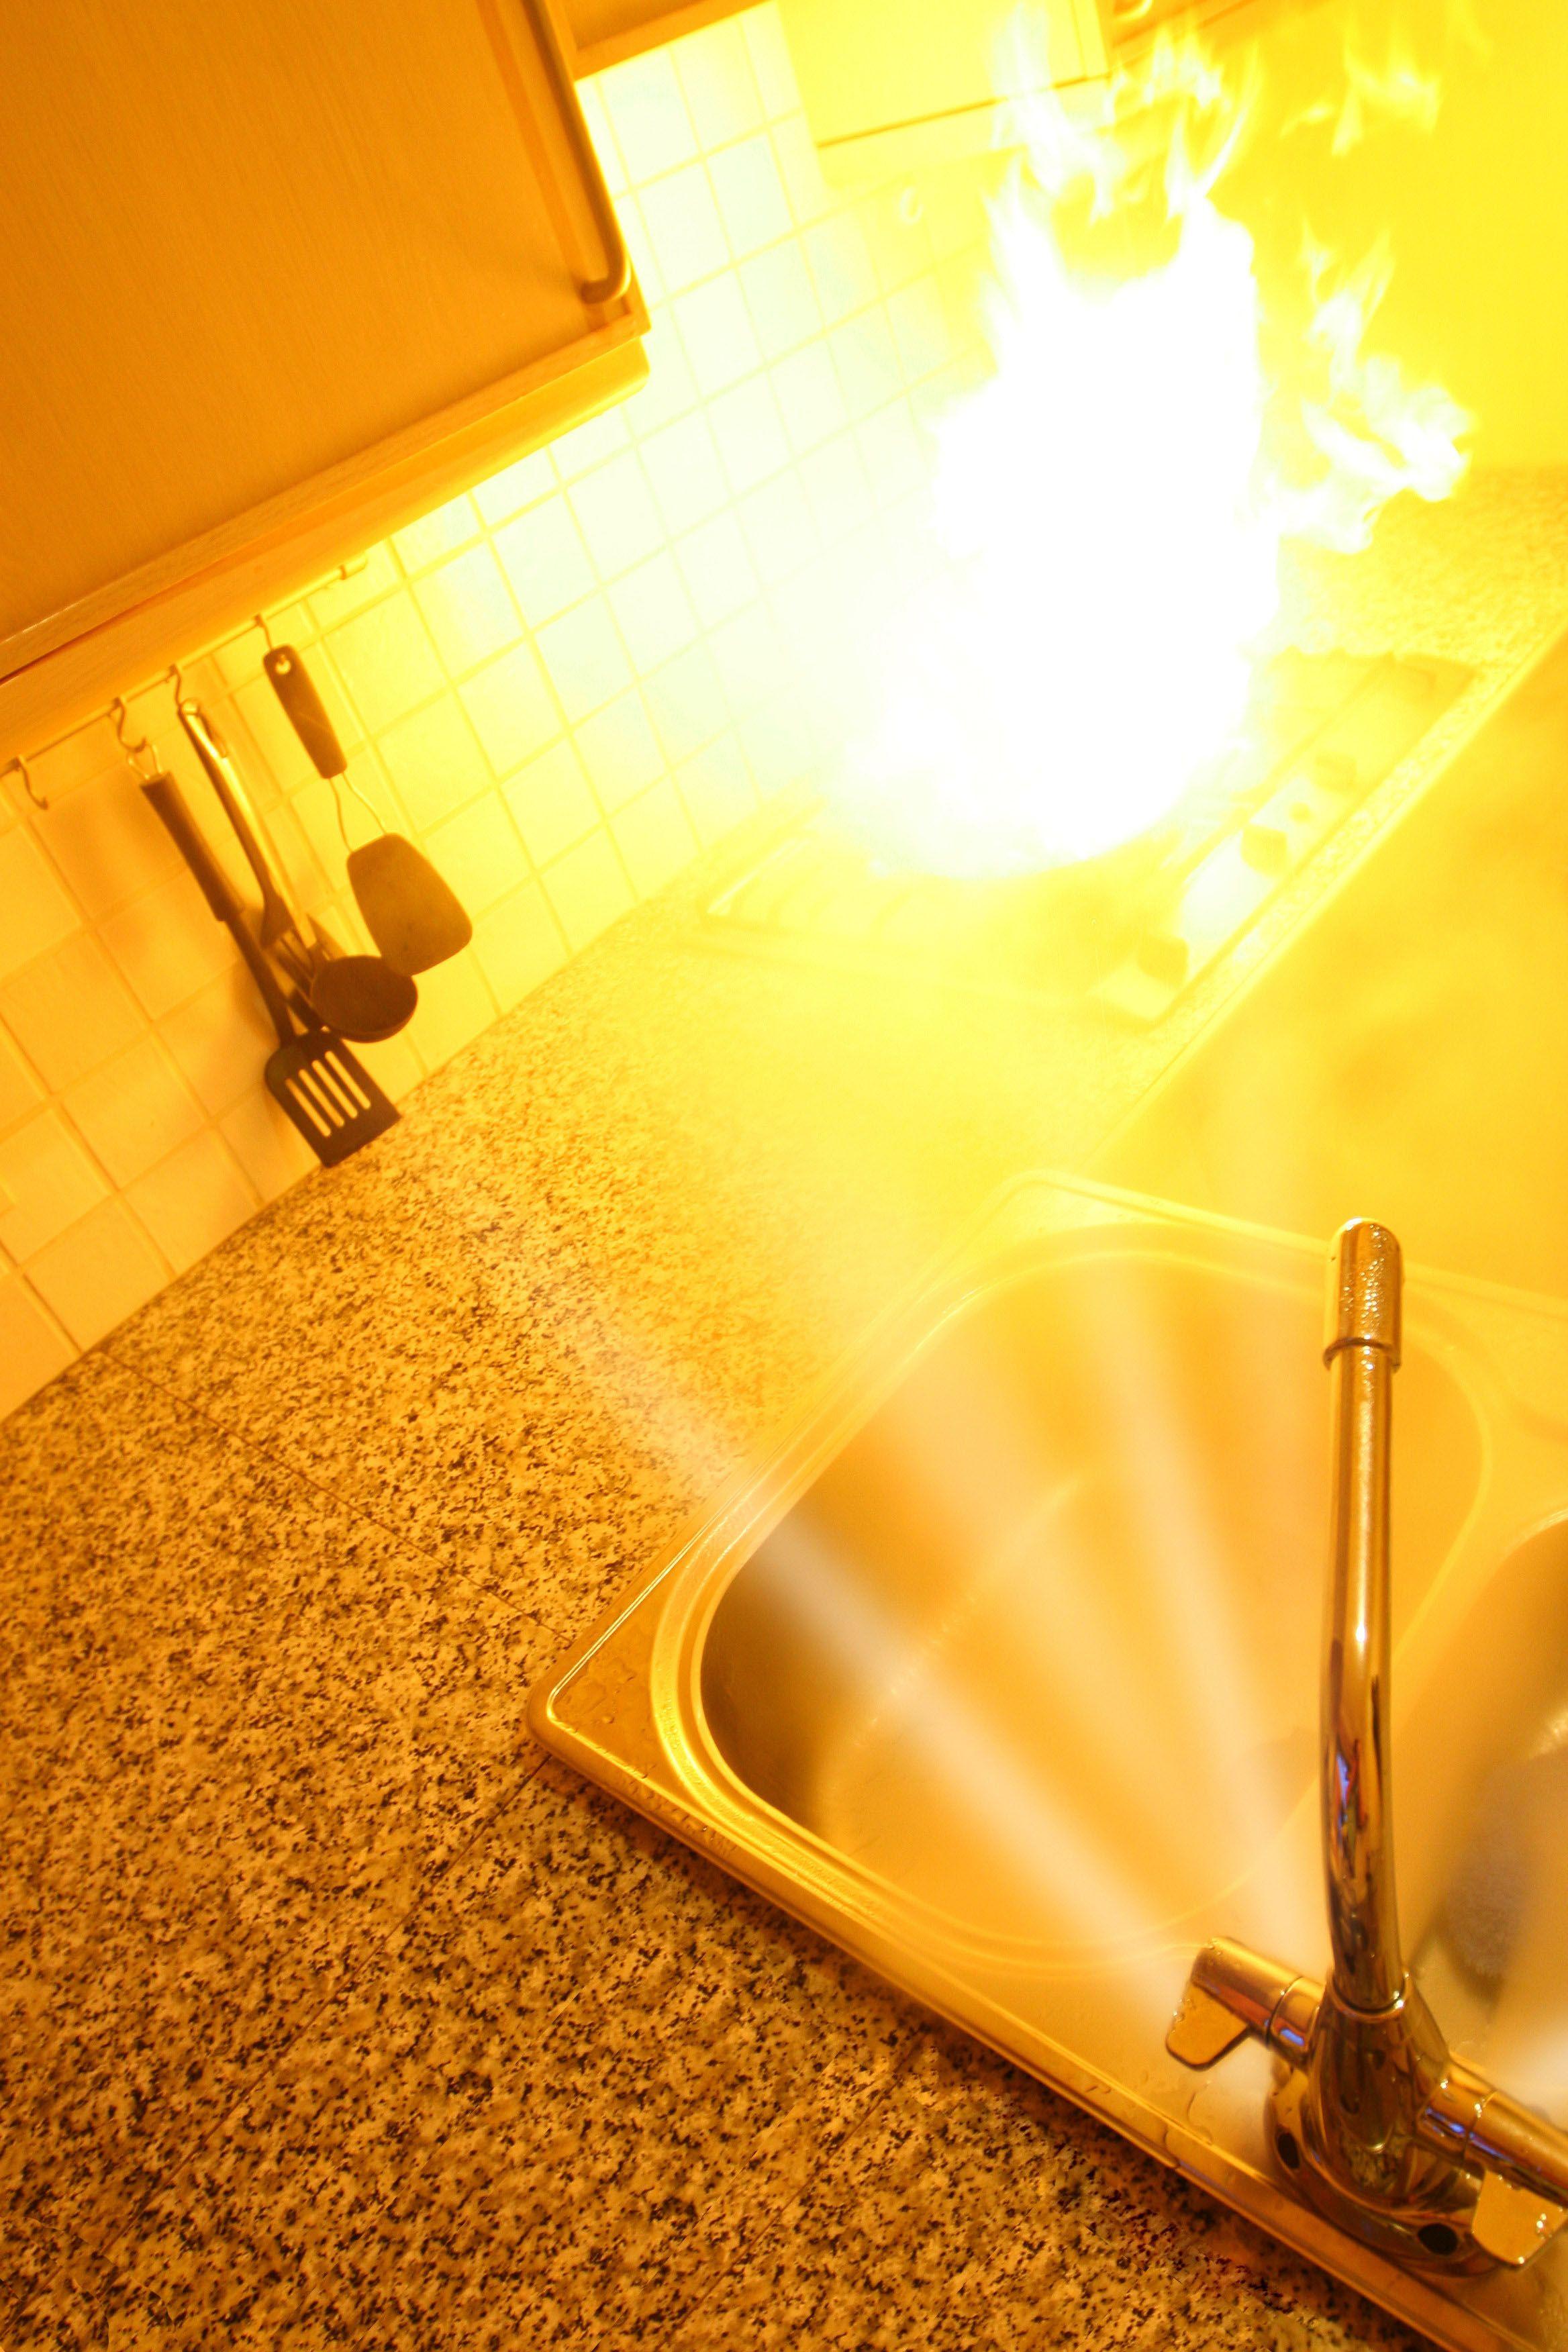 Domestic Sprinkler System Alternative MC Fire Protection